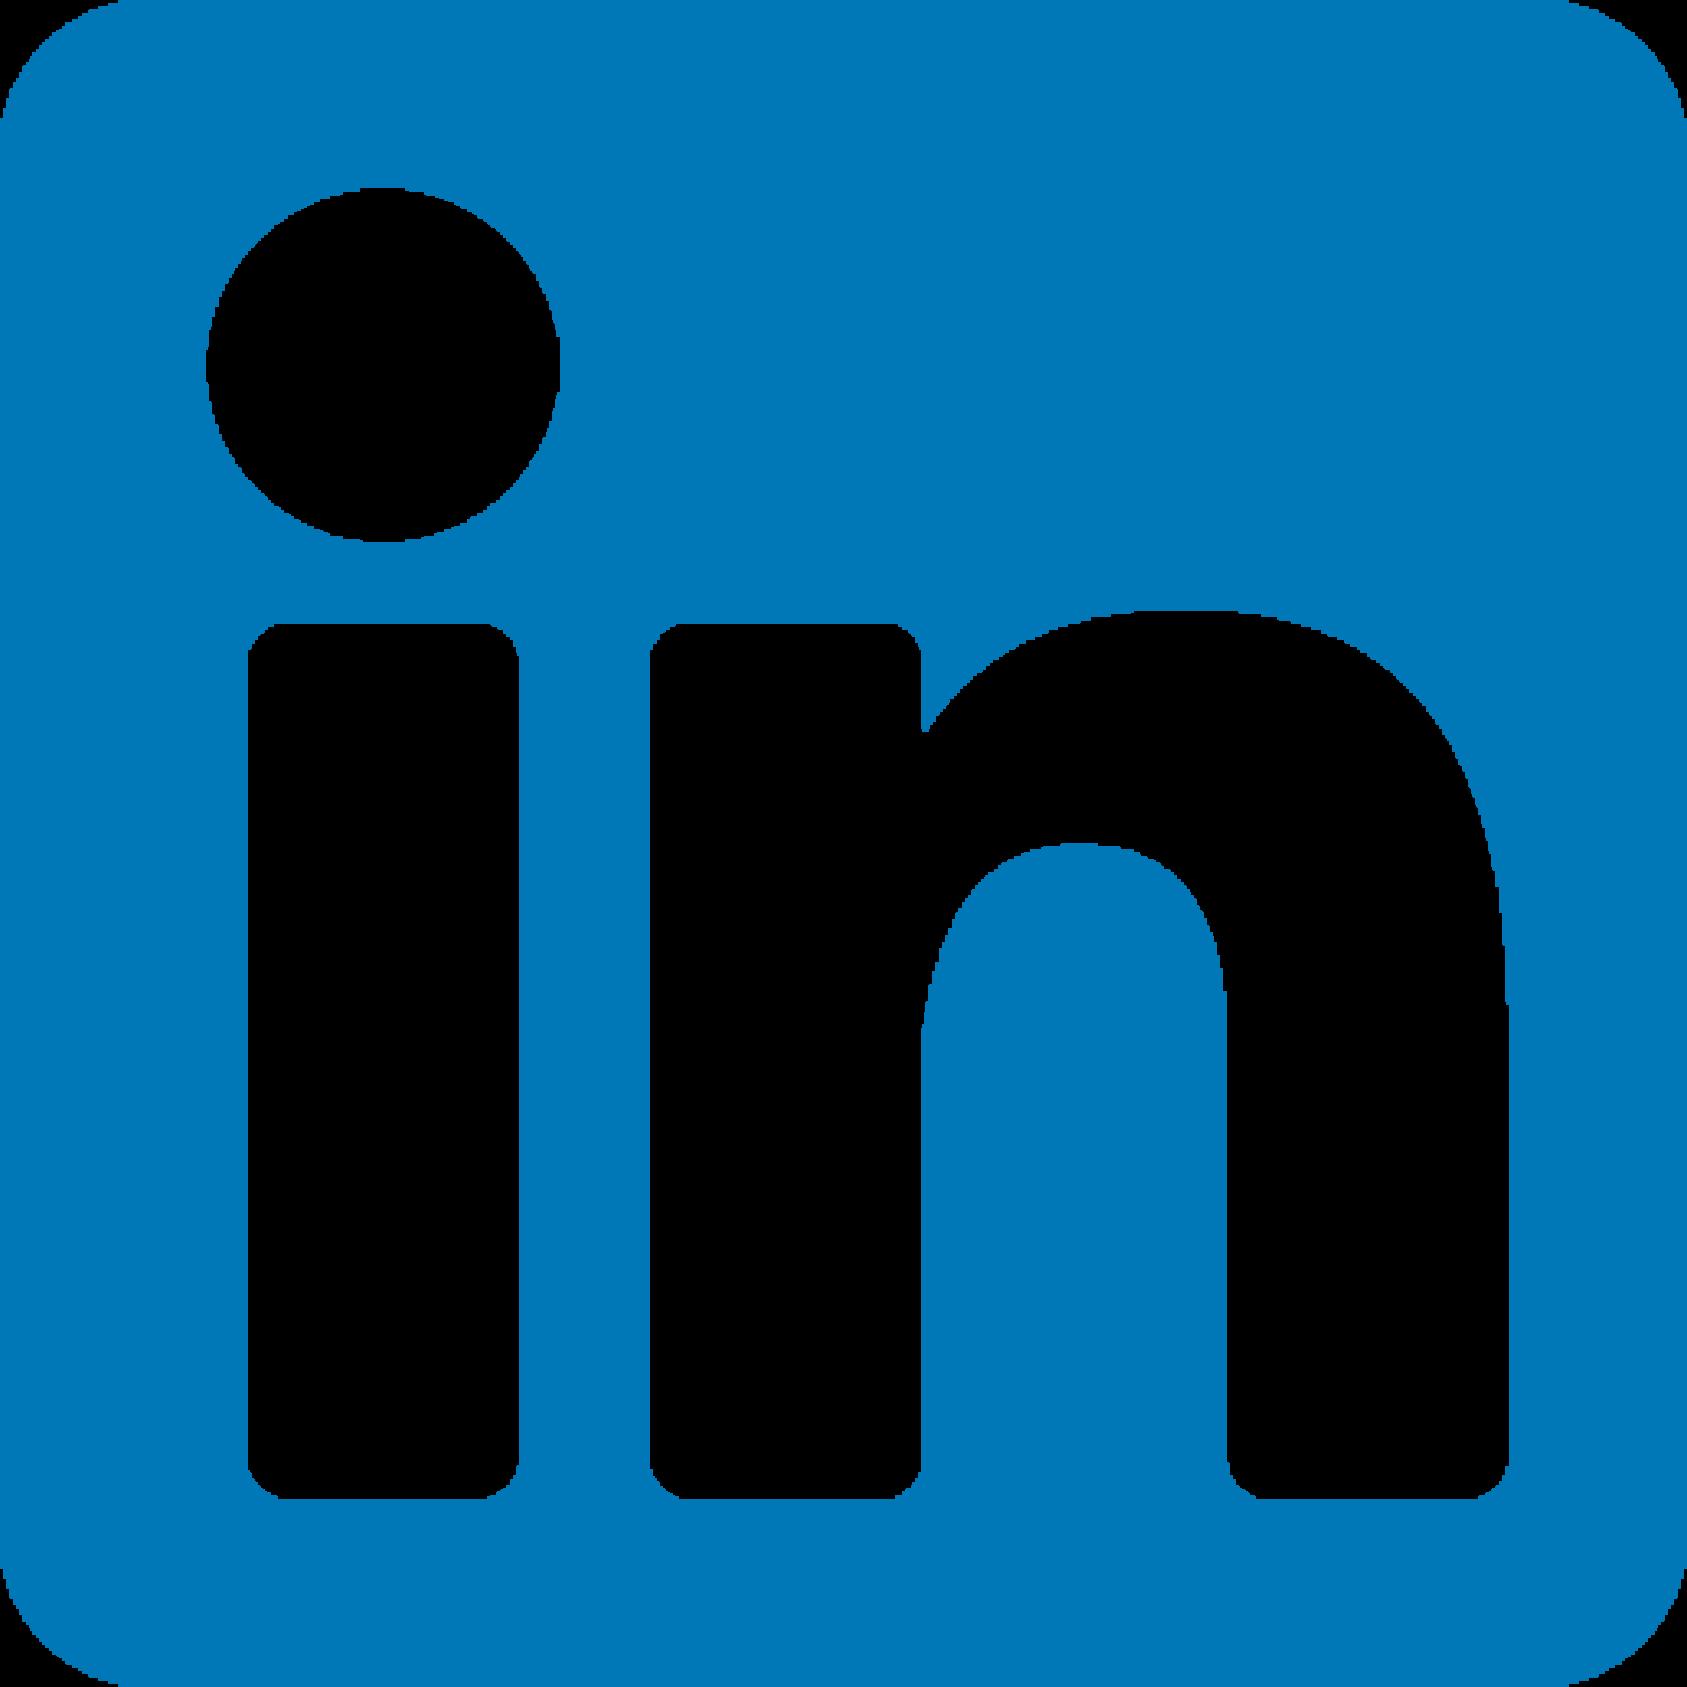 Follow BillericayTA on LinkedIn!